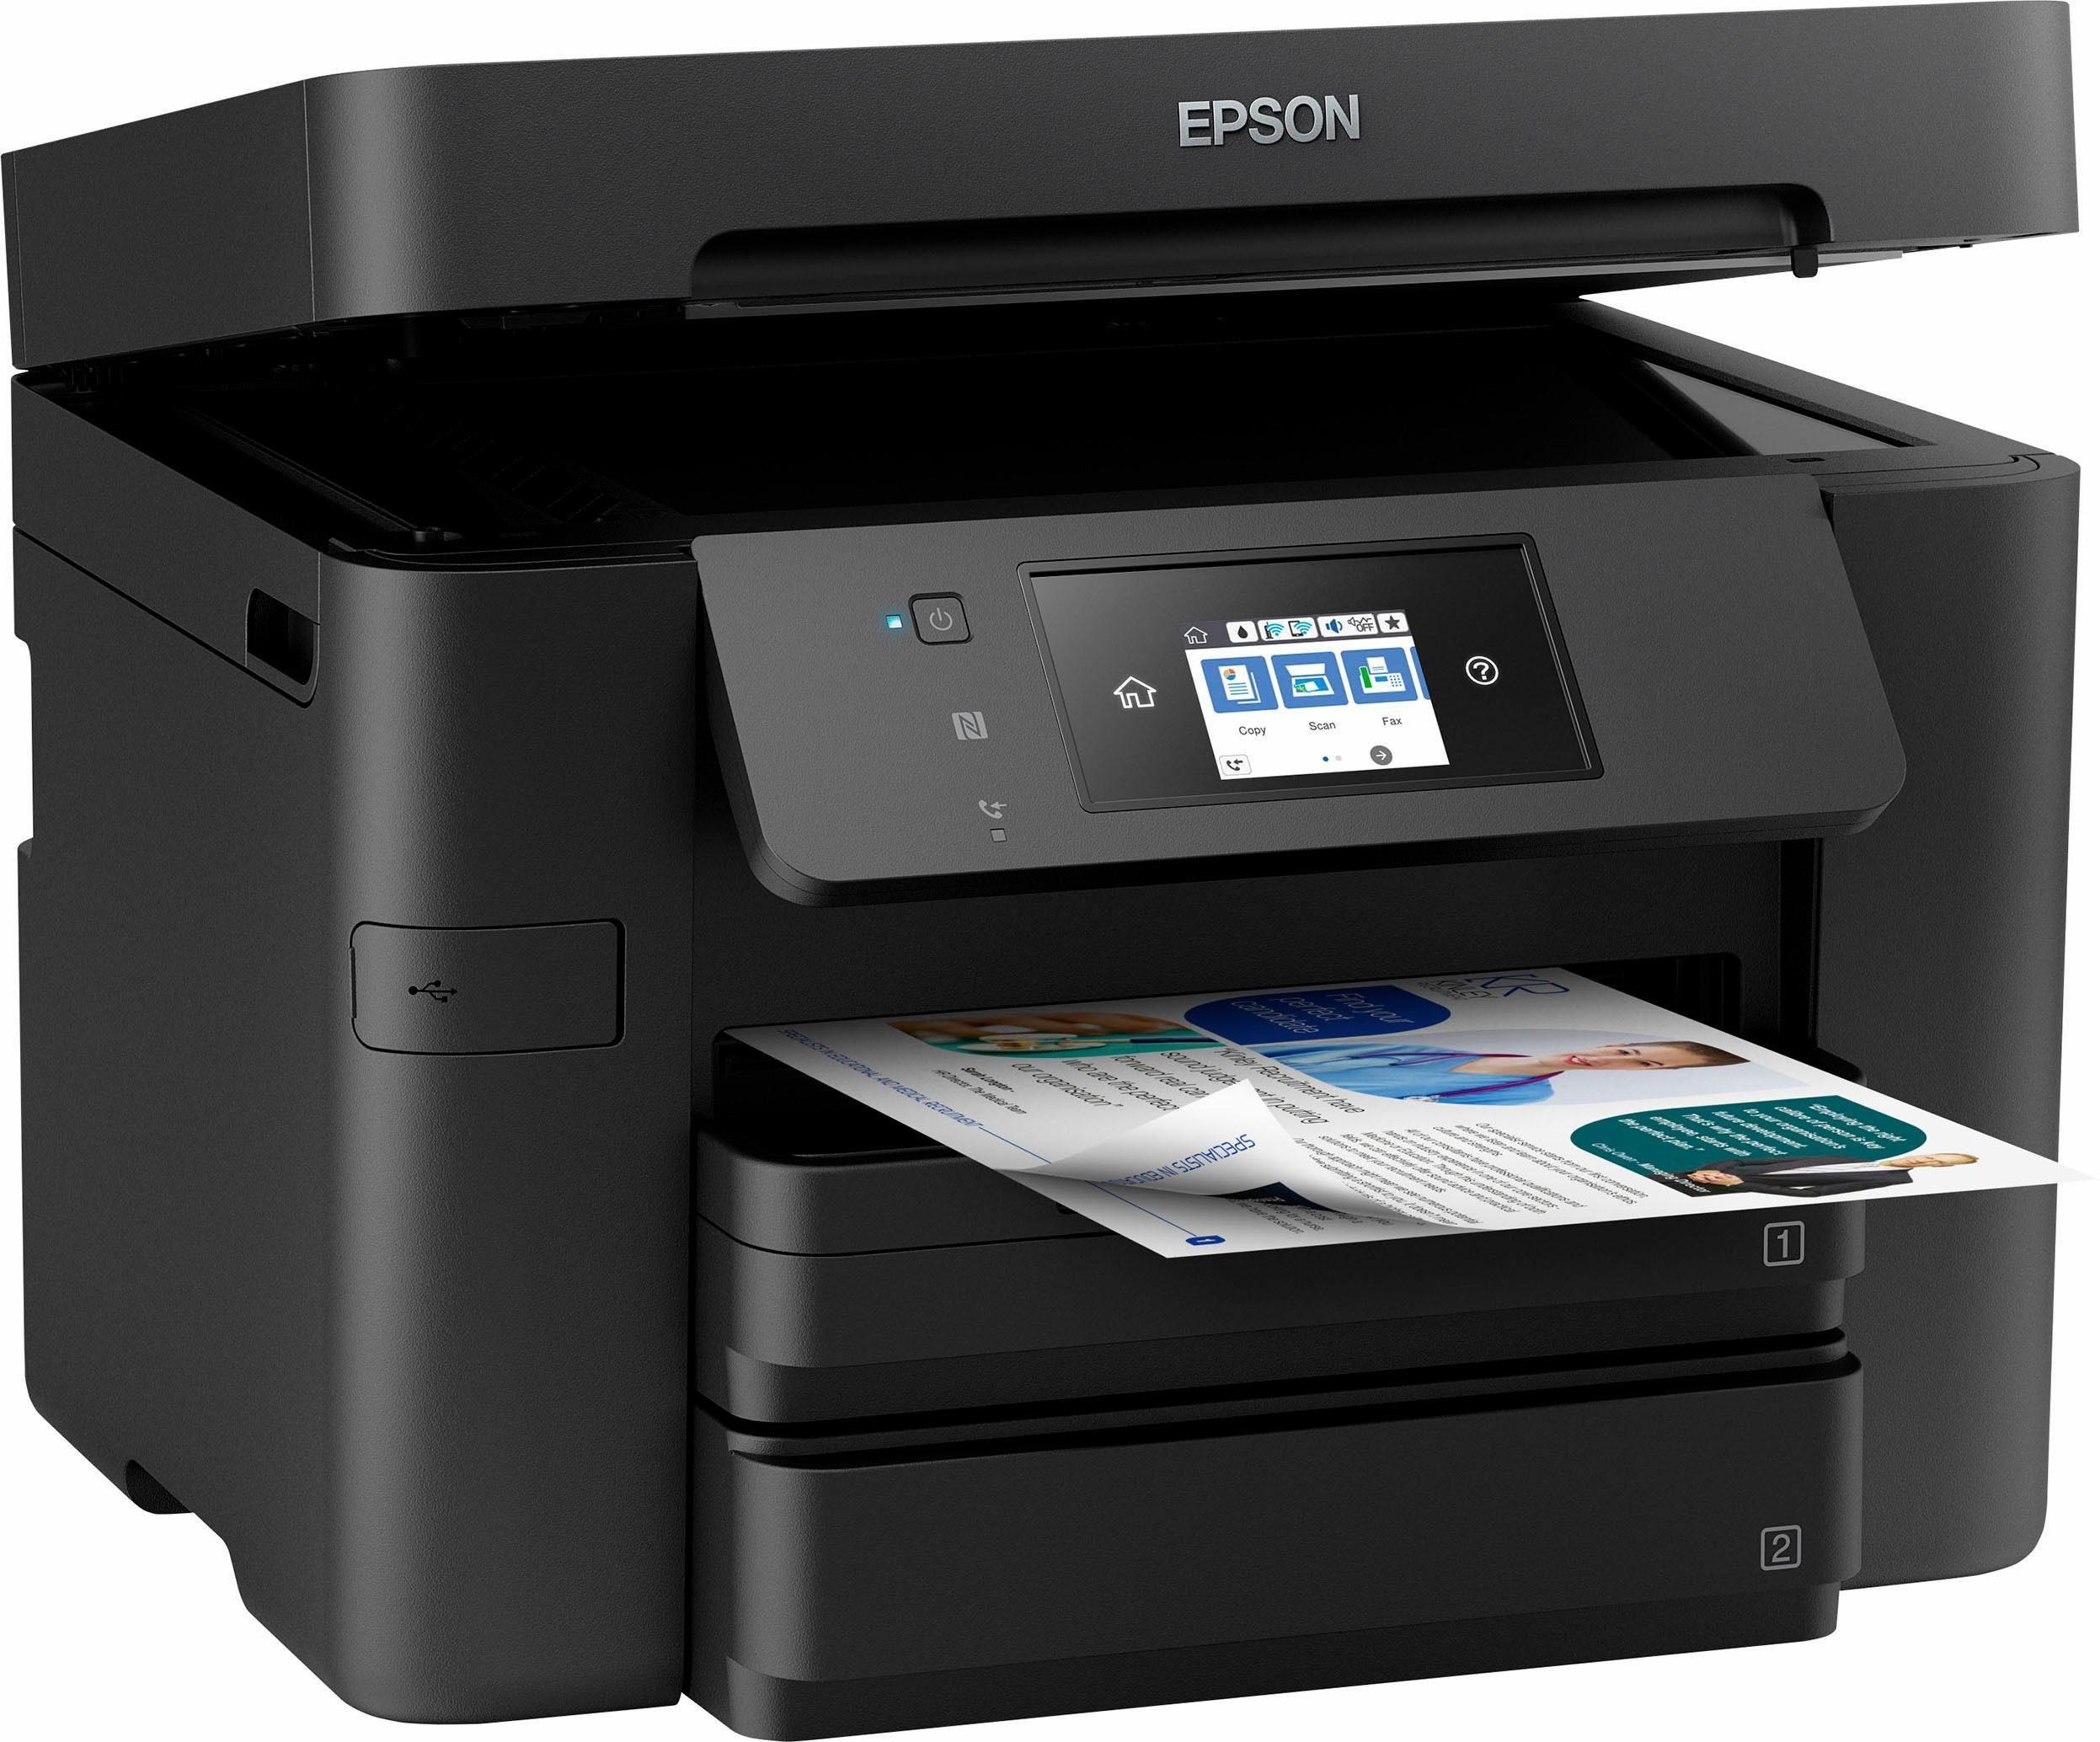 Epson WorkForce Pro WF-4730DTWF Multifunktionsdrucker